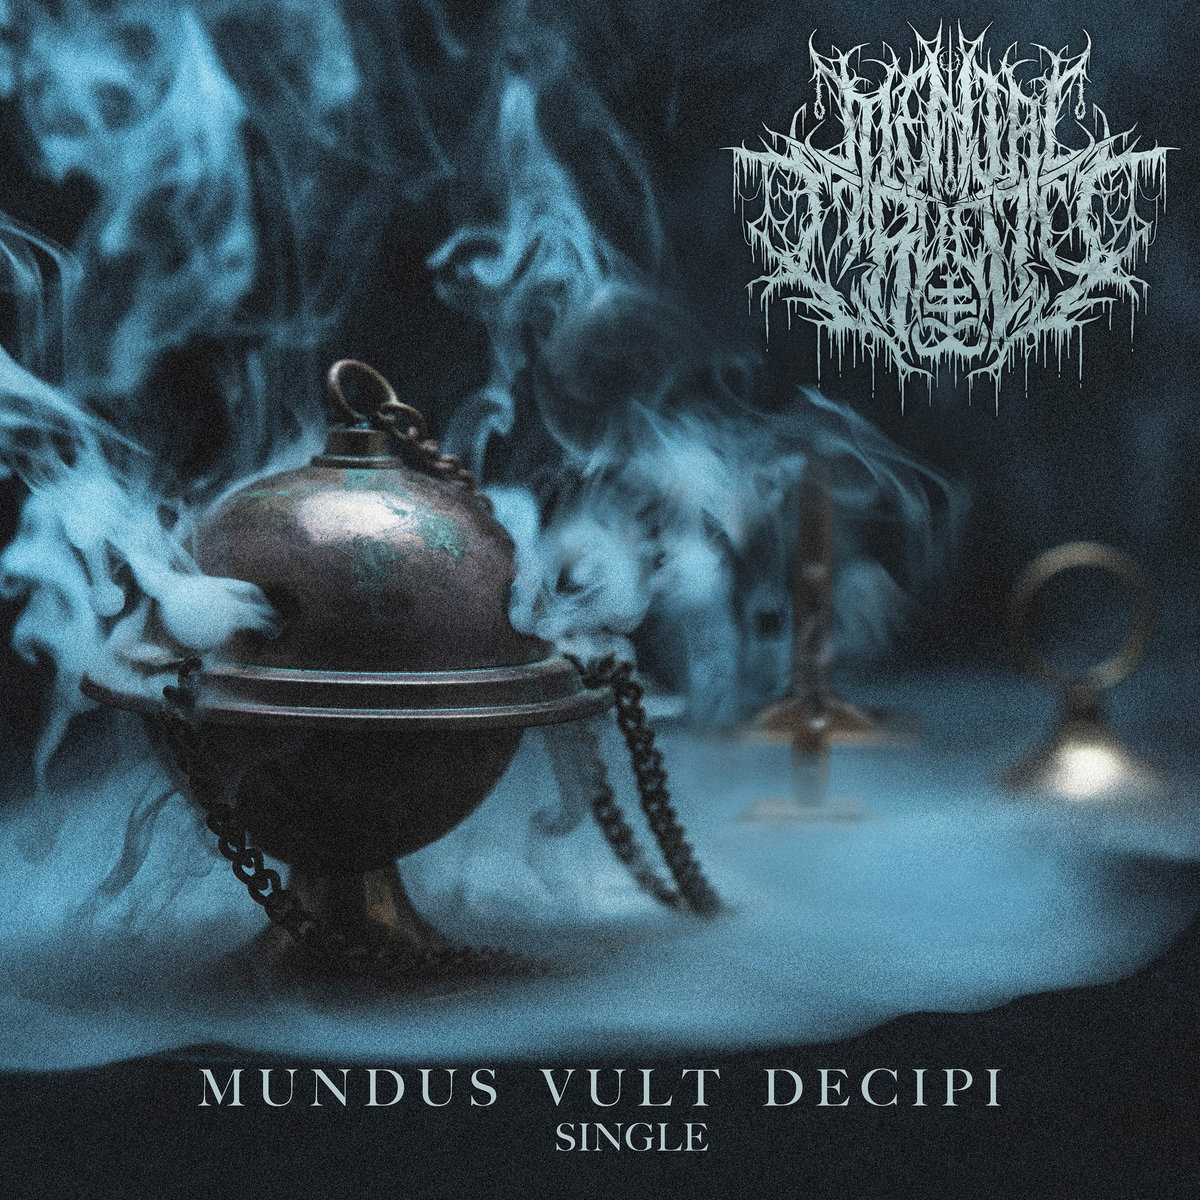 Mental Cruelty - Mundus Vult Decipi [Single] (2018)